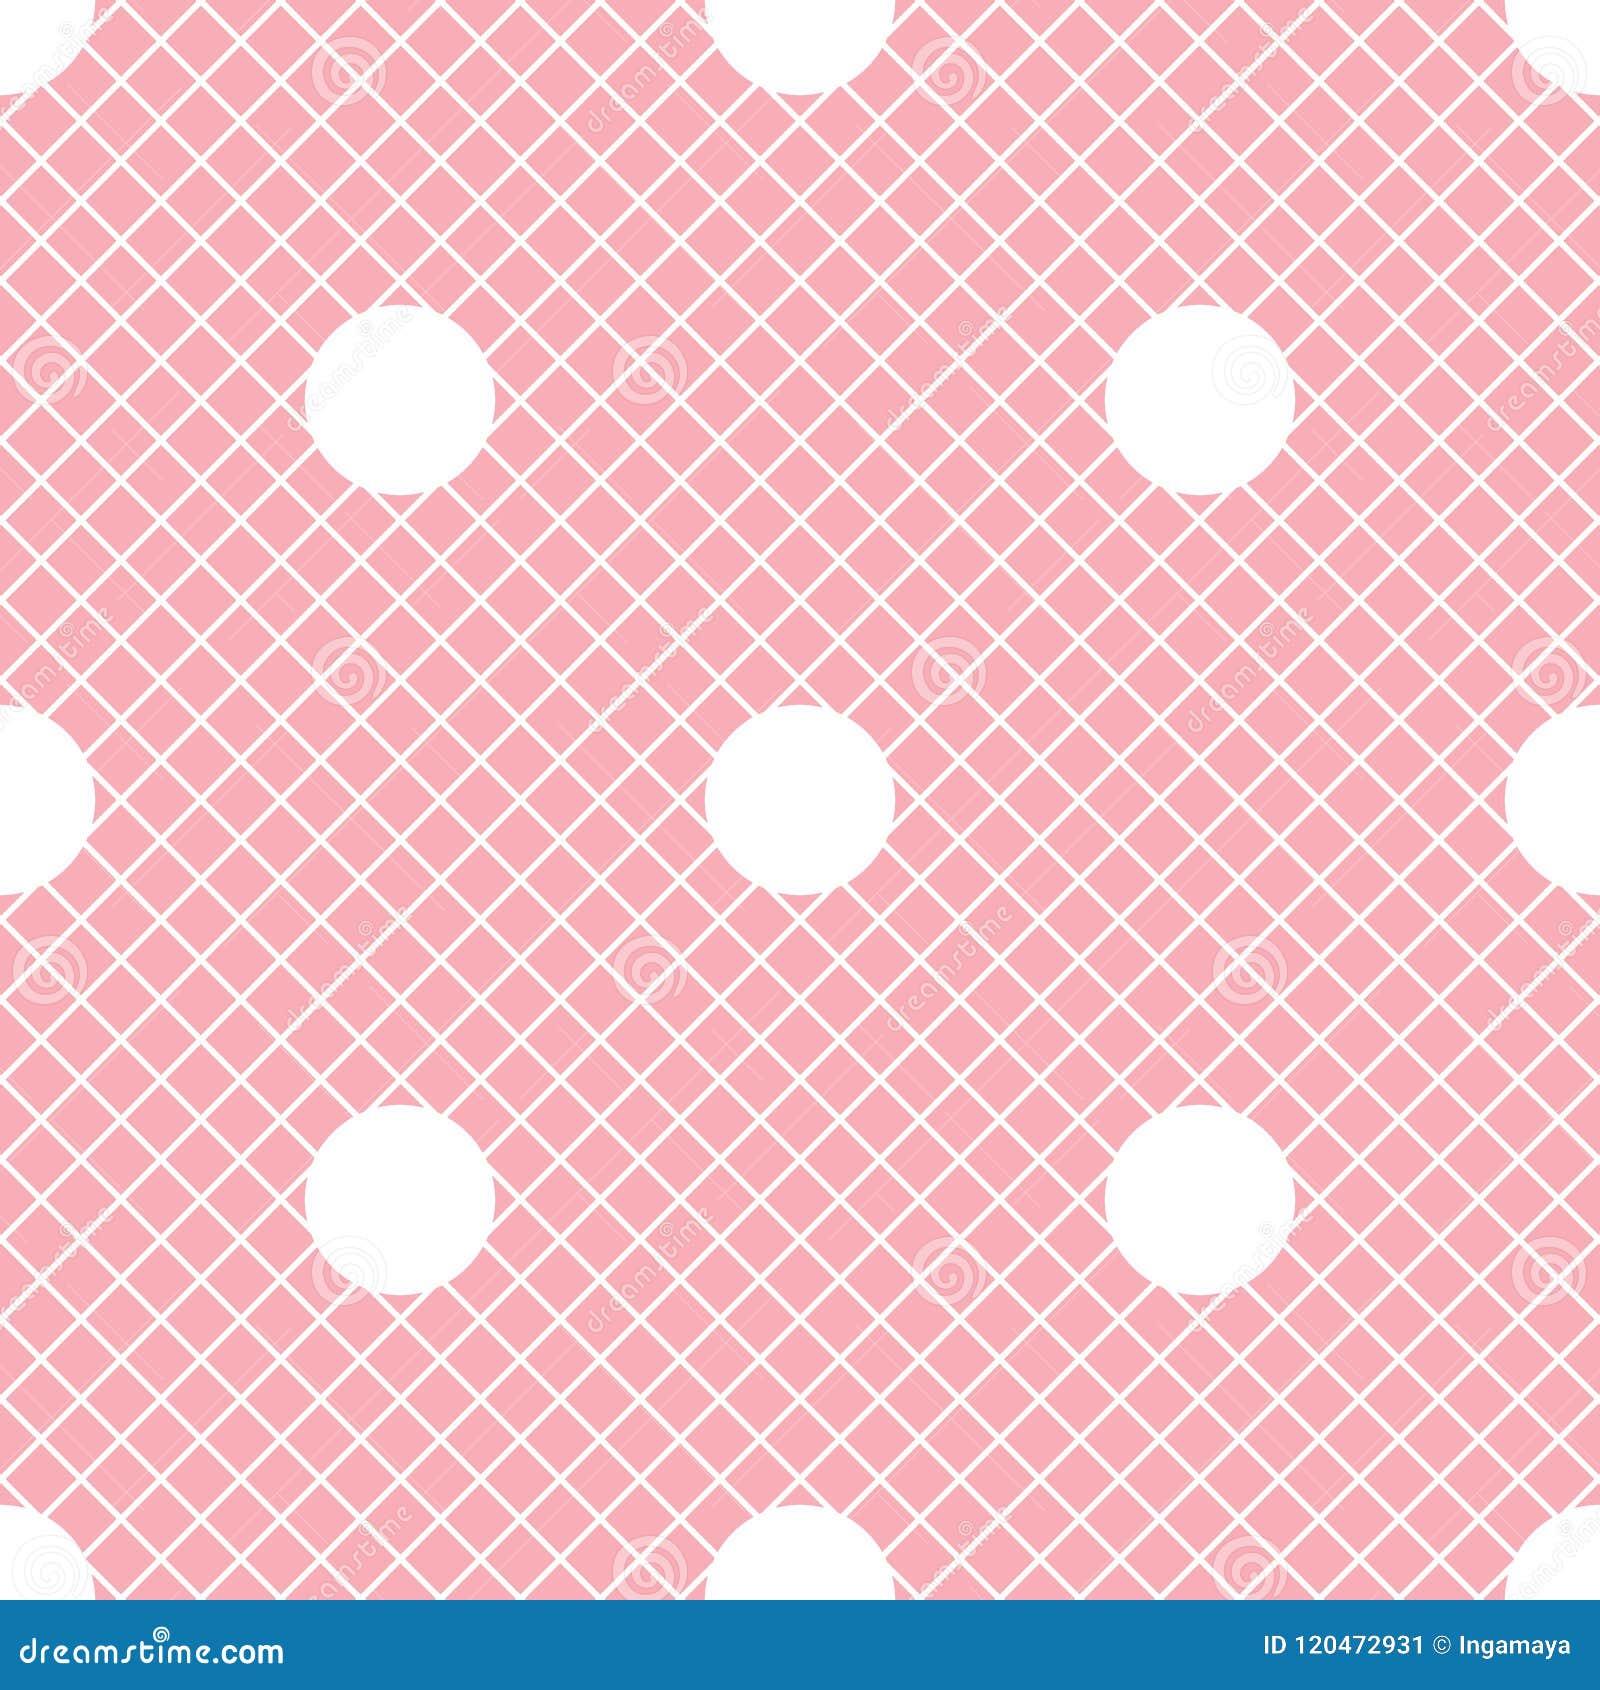 4fde63bbd Fishnet Tights Stock Illustrations – 116 Fishnet Tights Stock  Illustrations